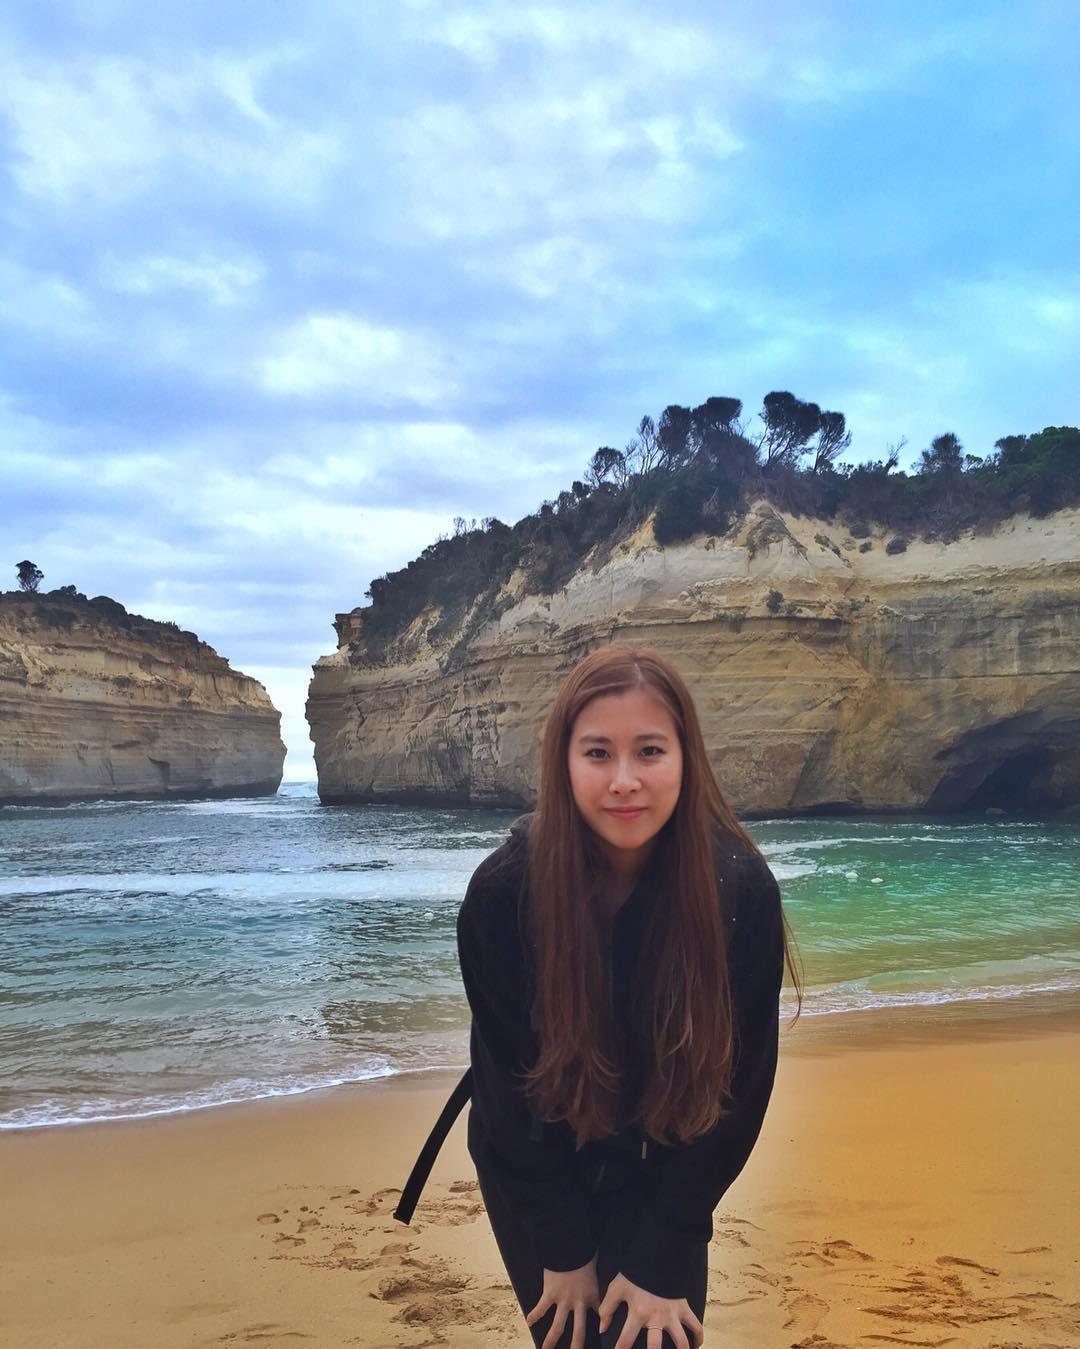 I had a nice experience  죽기전에 가봐야하는곳!! 그레이트오션로드 . . . . #au#australia#melbourne#greatoceanroad#tour#그레이트오션로드#호주#멜번 by ellen__u